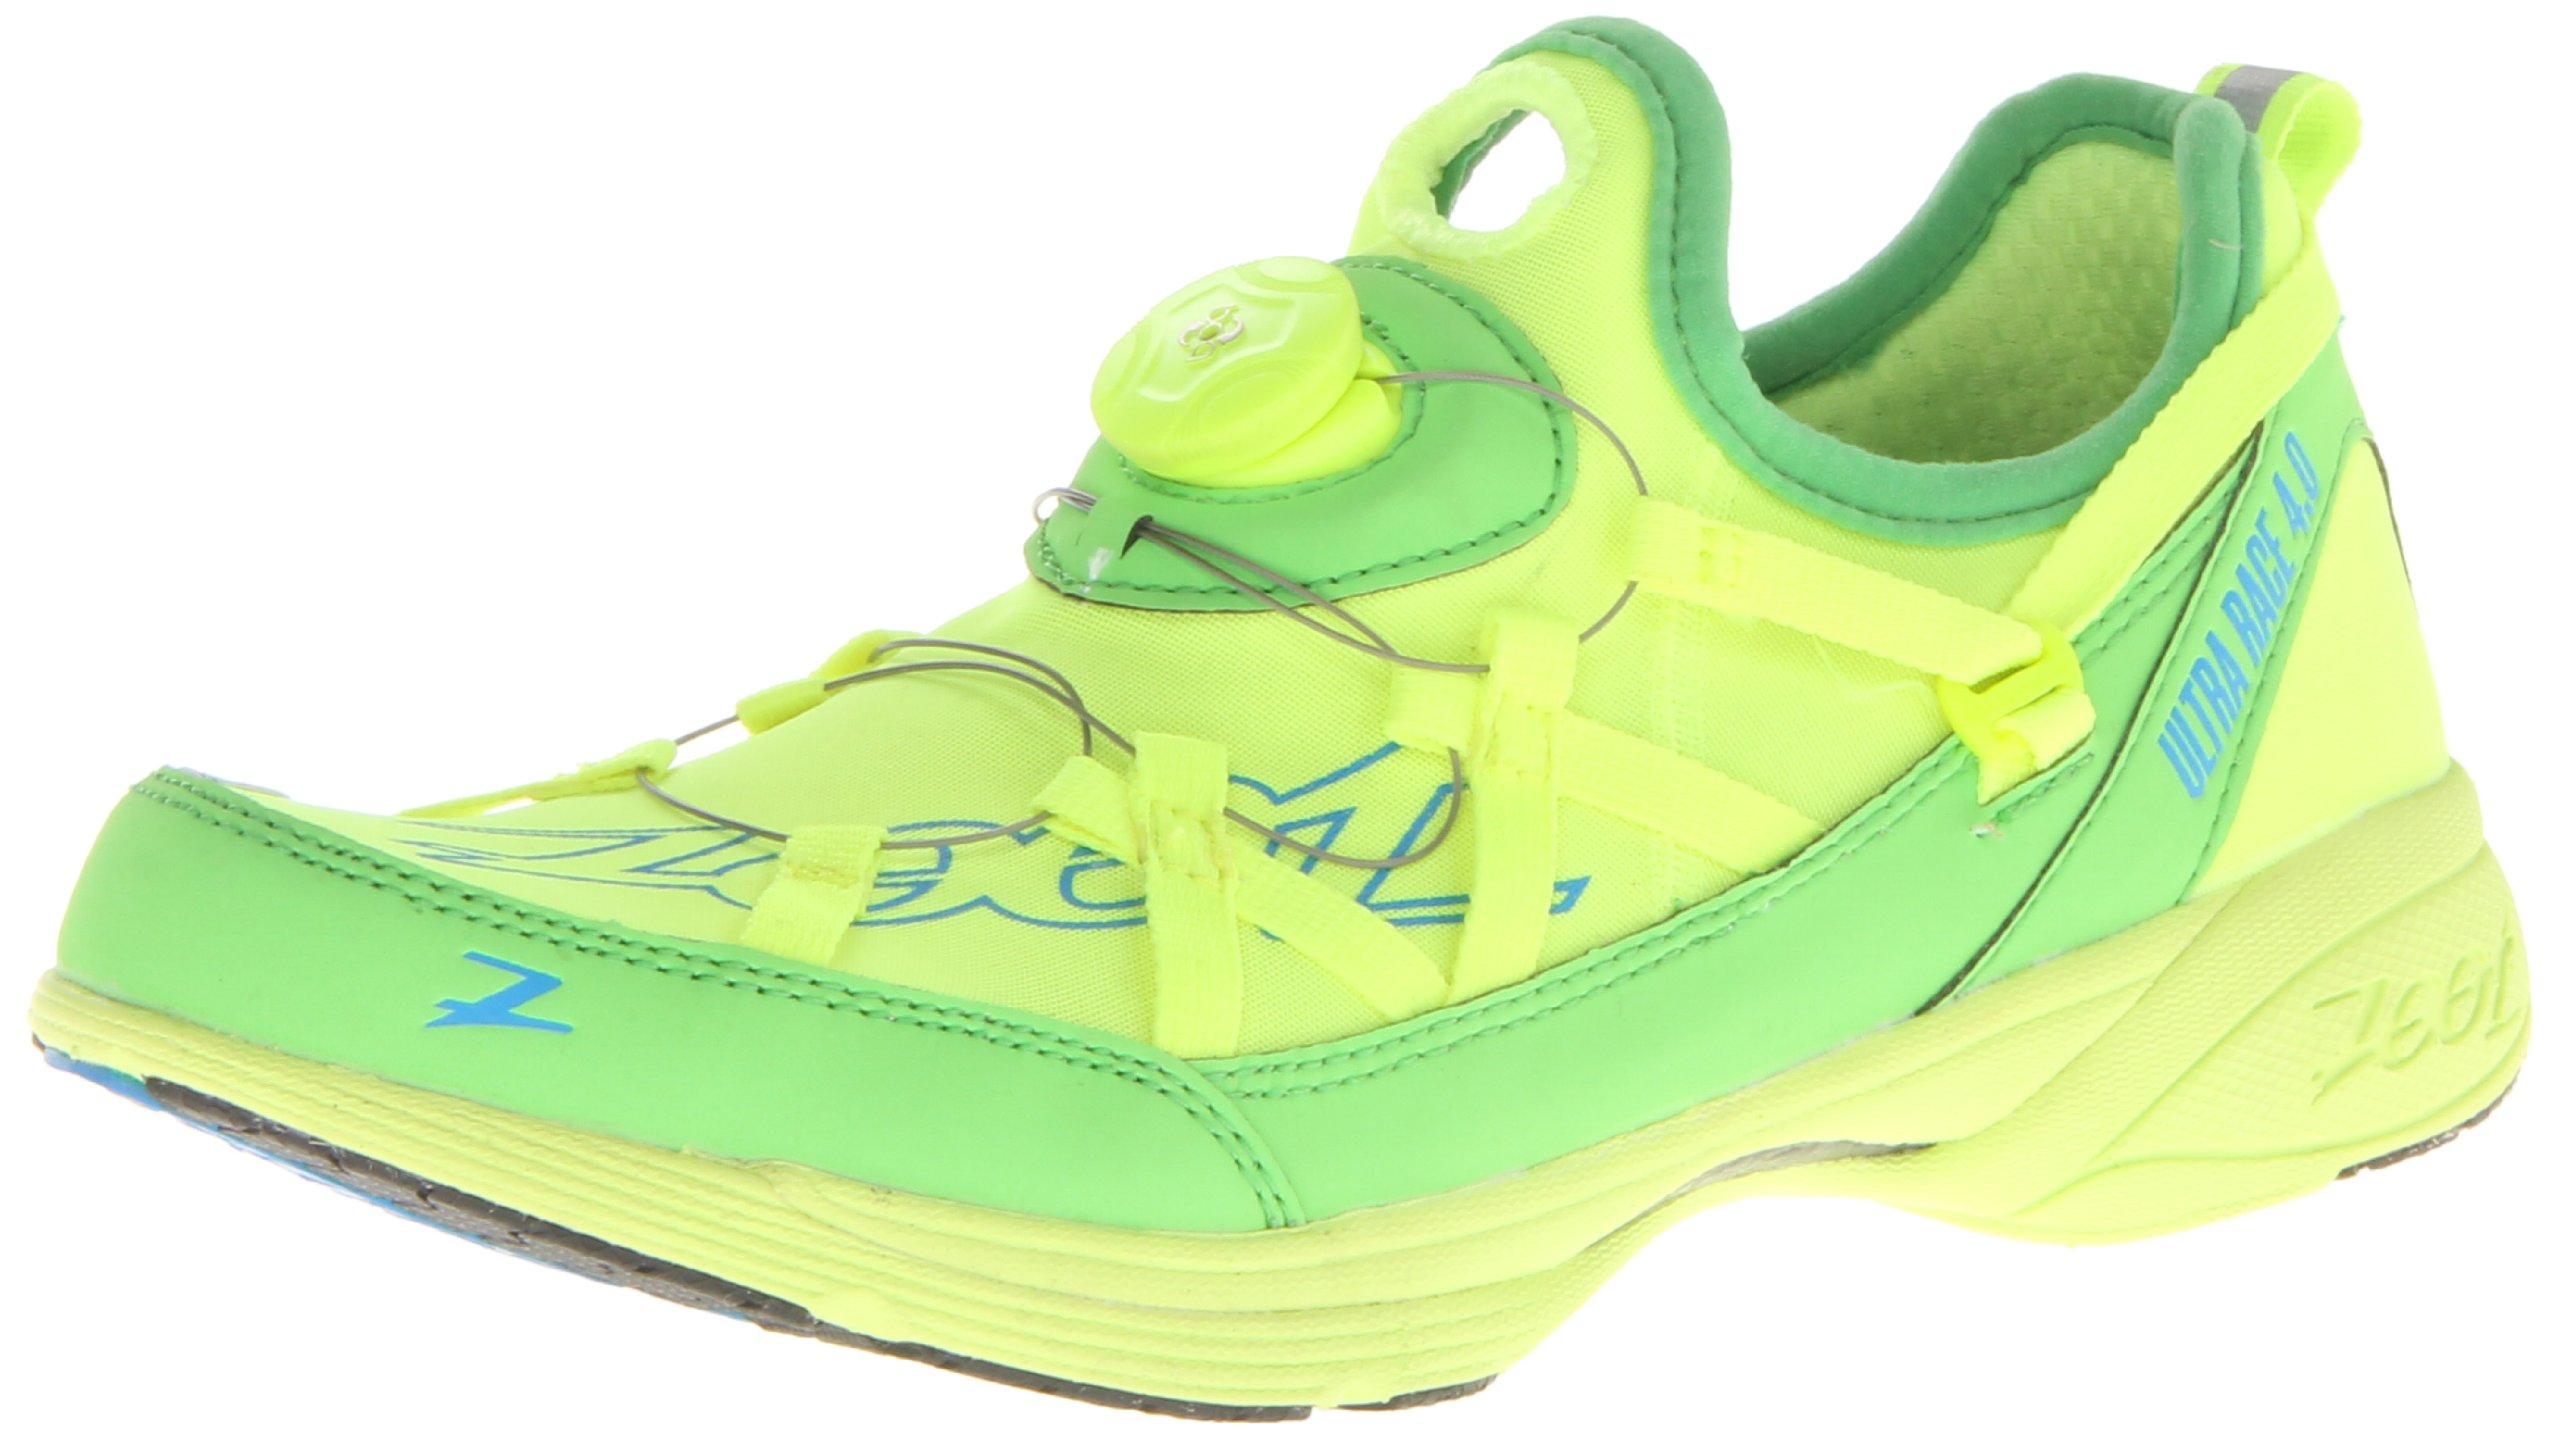 Zoot Men's Ultra Race 4.0 Boa Running Shoe